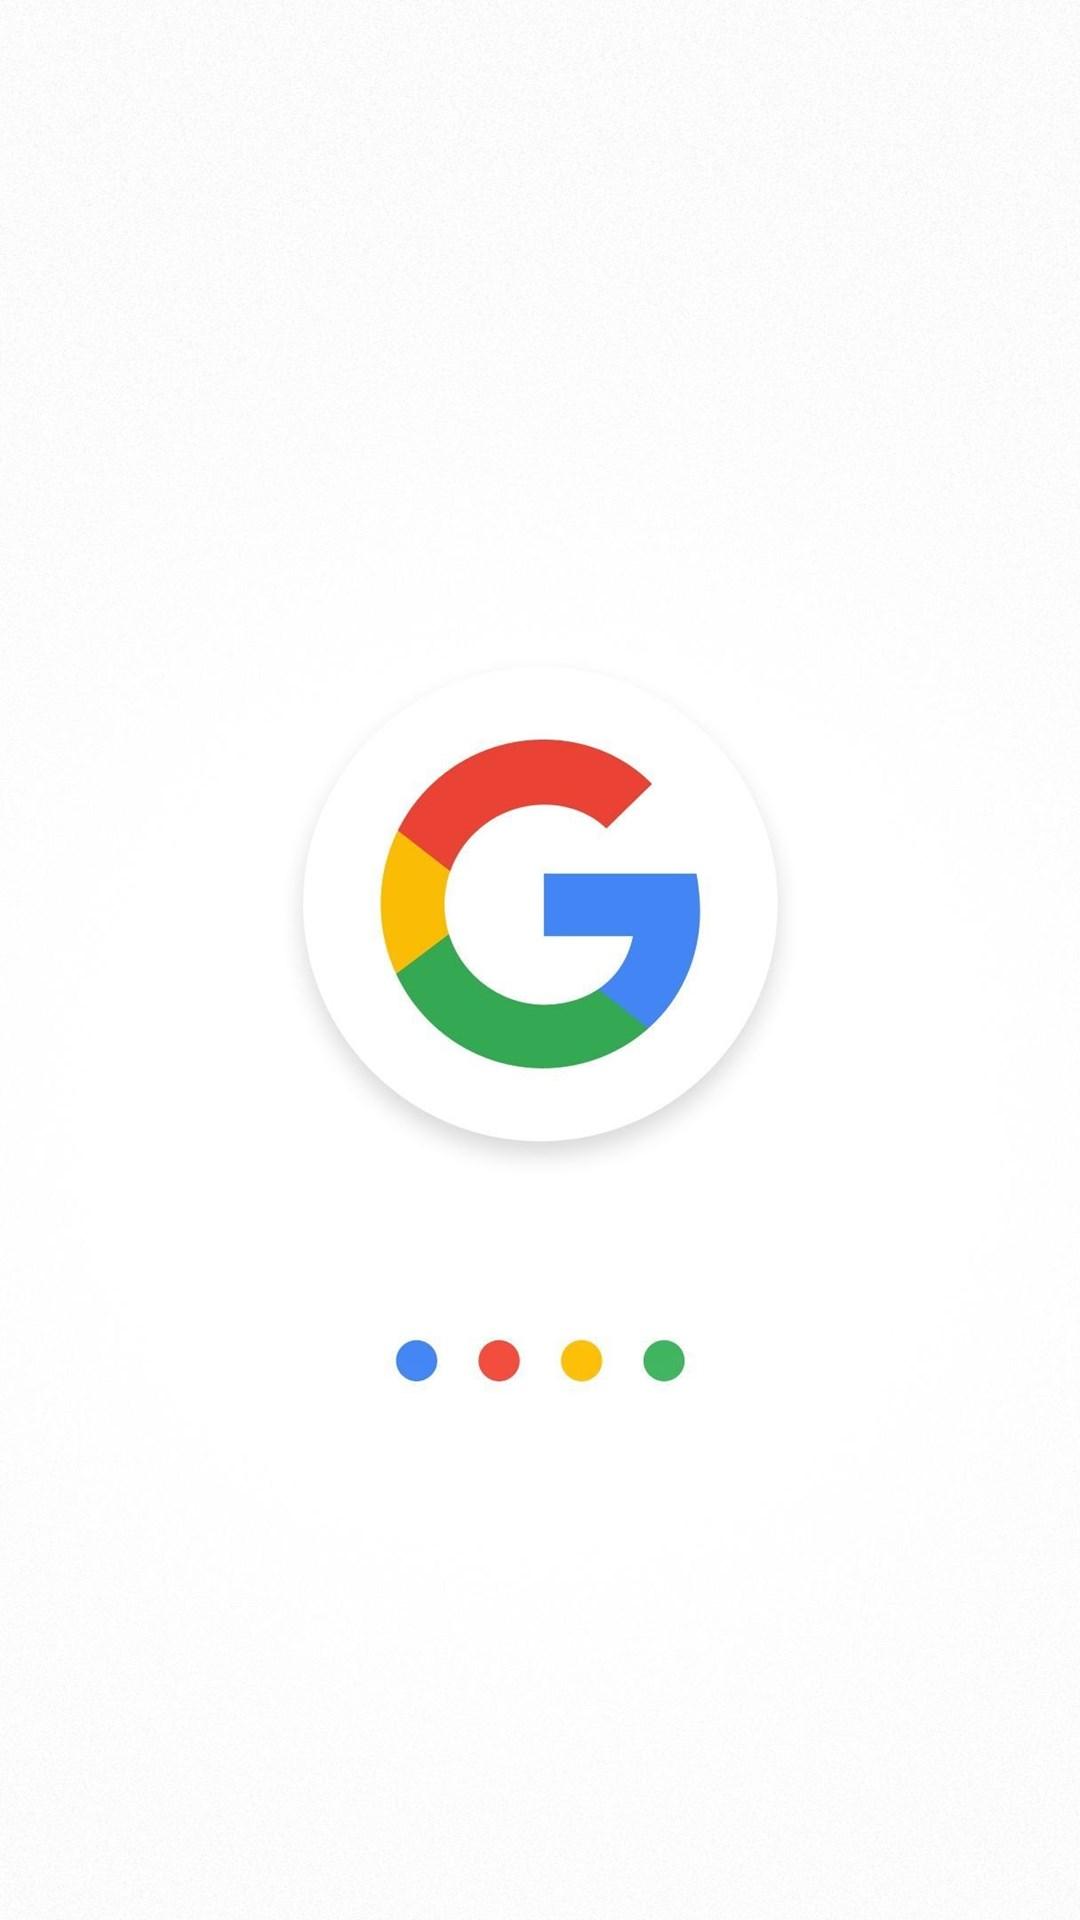 4k Google G Minimalistic Wallpapers By Jovicasmileski On